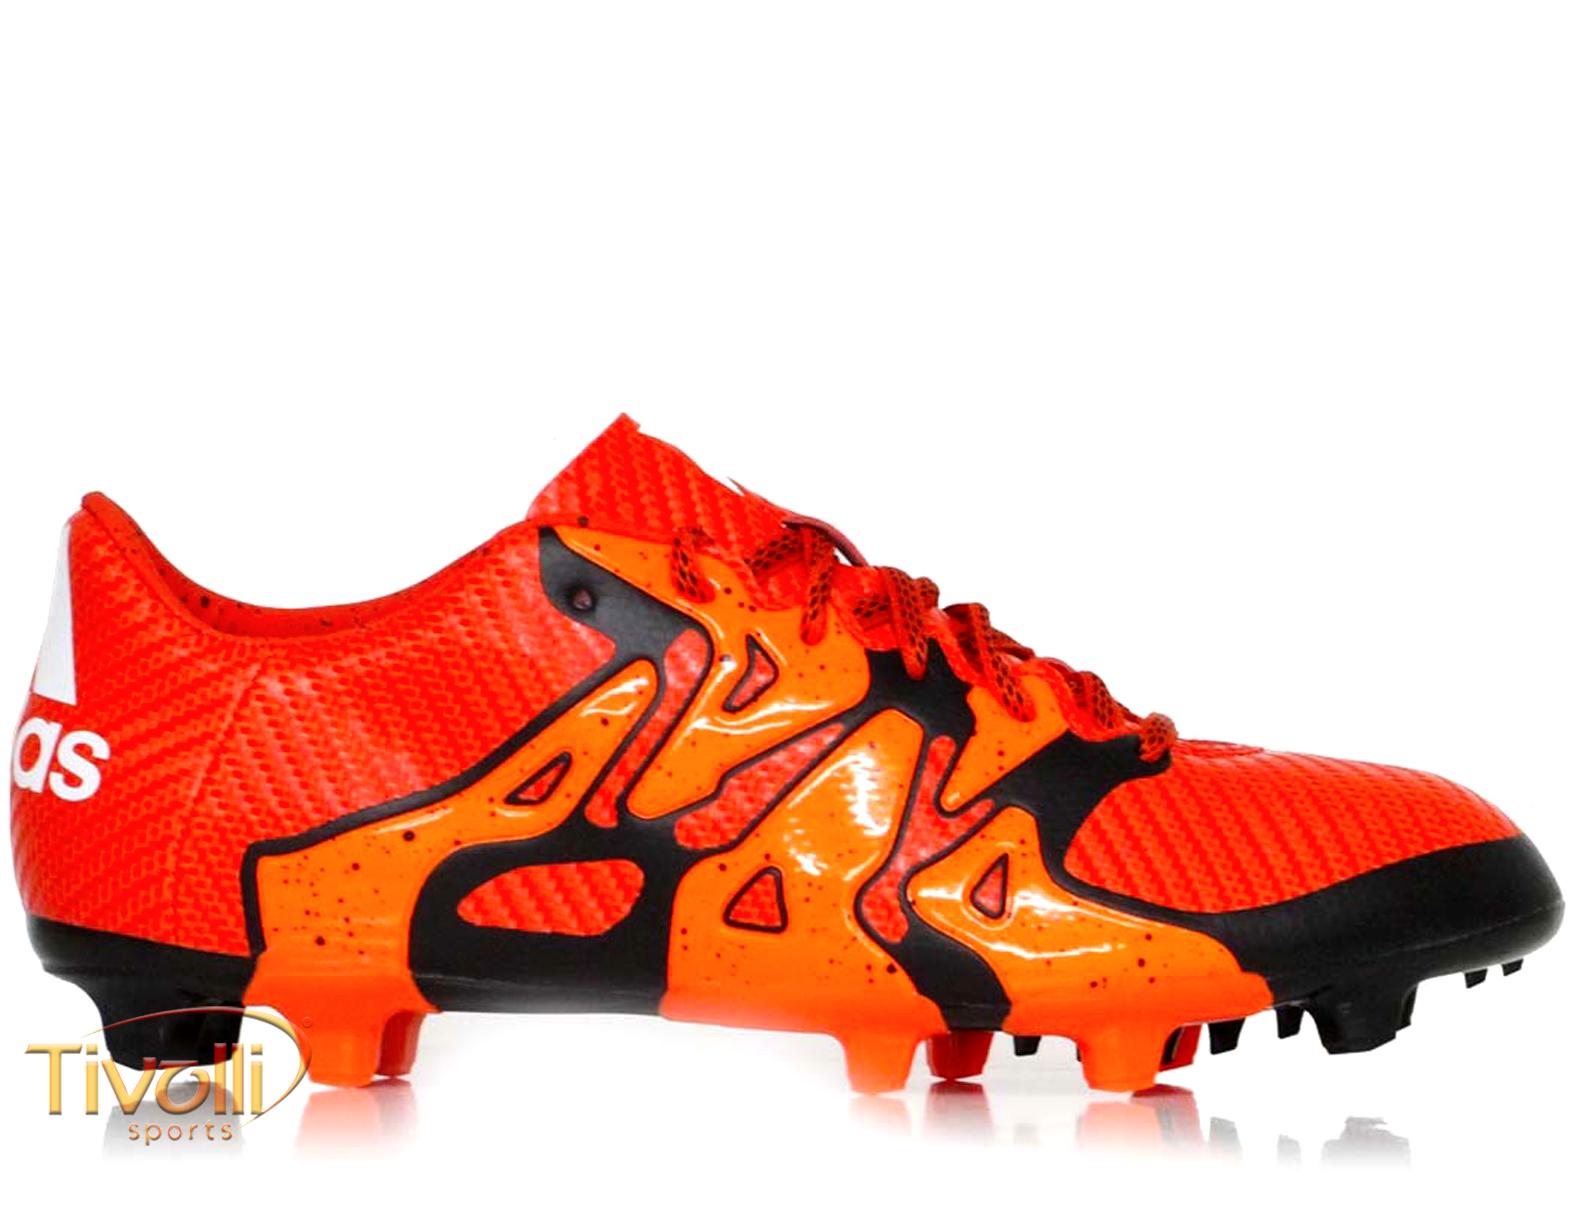 Chuteira Adidas X 15.3 FG Futebol de Campo   Laranja Branco e Preto   ea451ed515678